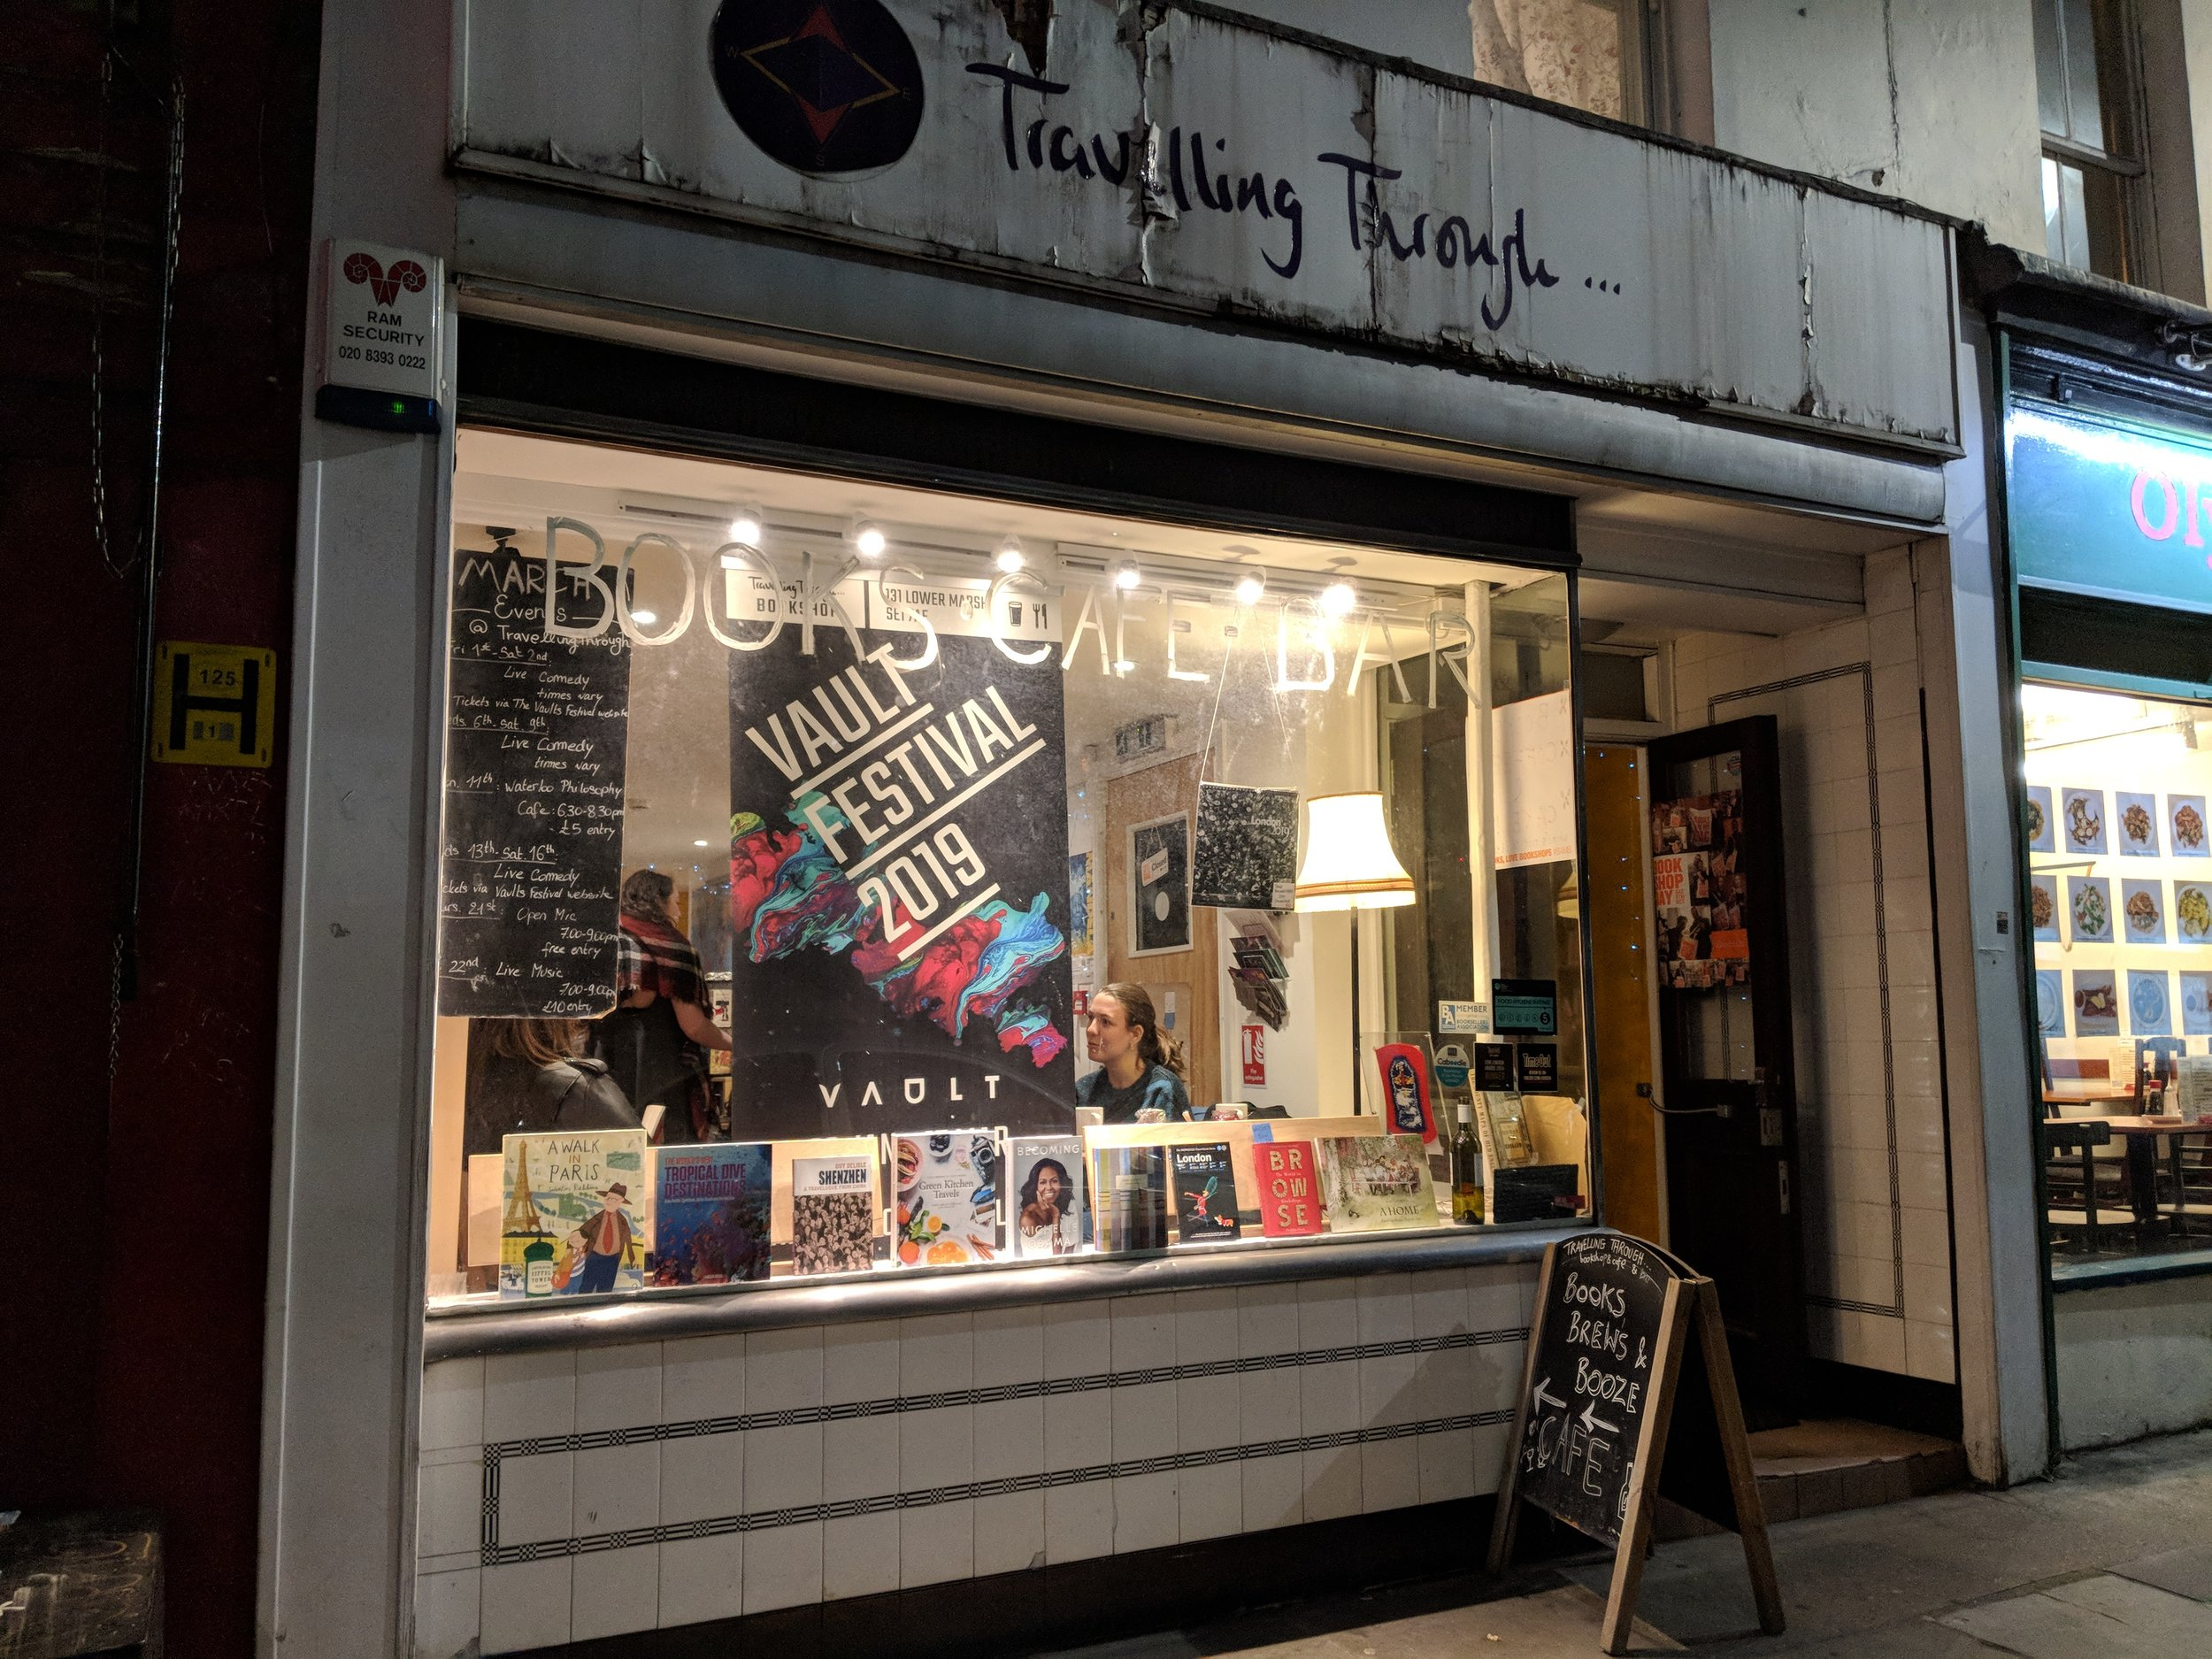 Travelling Through… Bookshop - Visited 09/03/2019